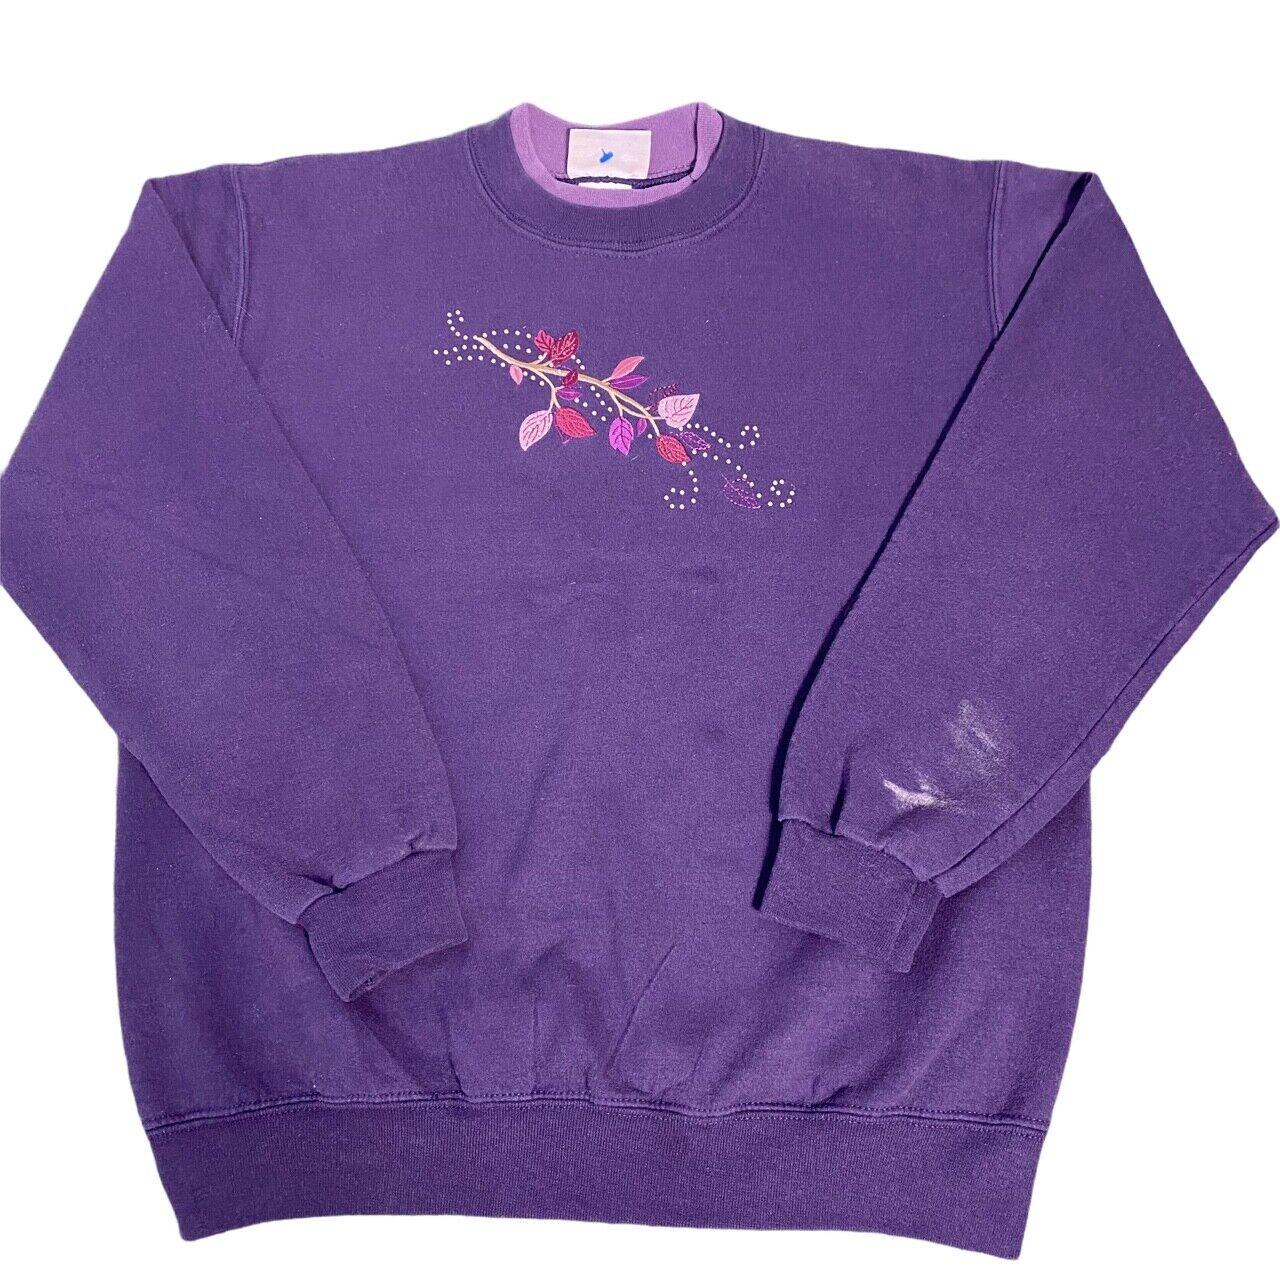 Purple American Vintage Day Breeze USA Grandma Double Collar Nature Sweatshirt